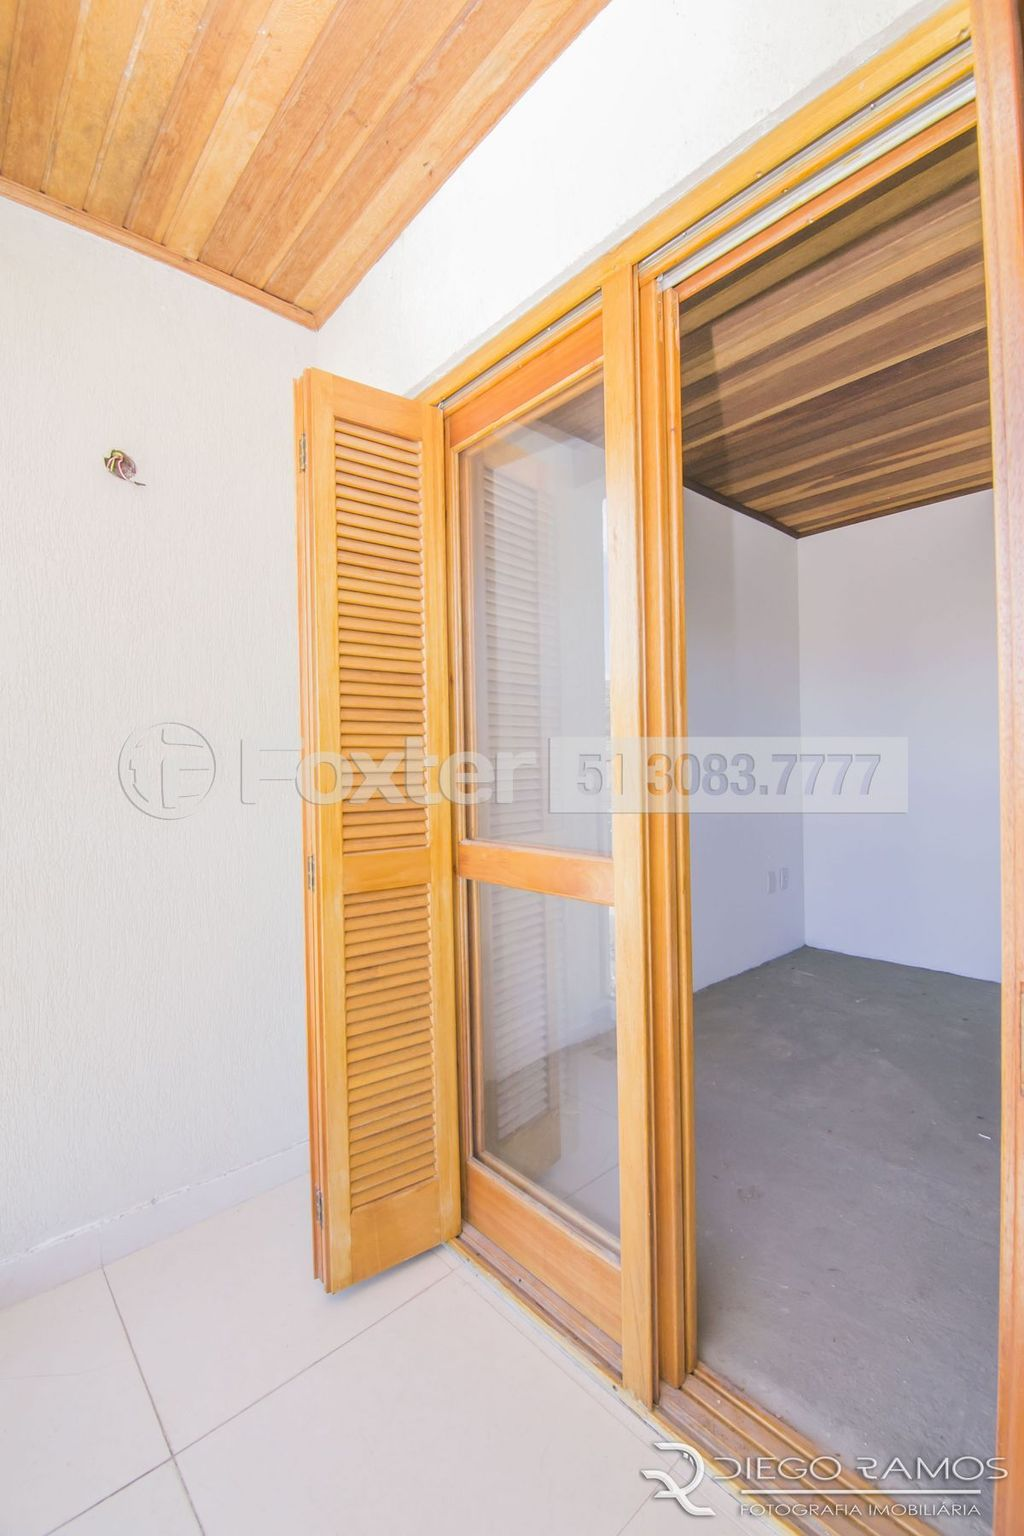 Casa 3 Dorm, Aberta dos Morros, Porto Alegre (120679) - Foto 18